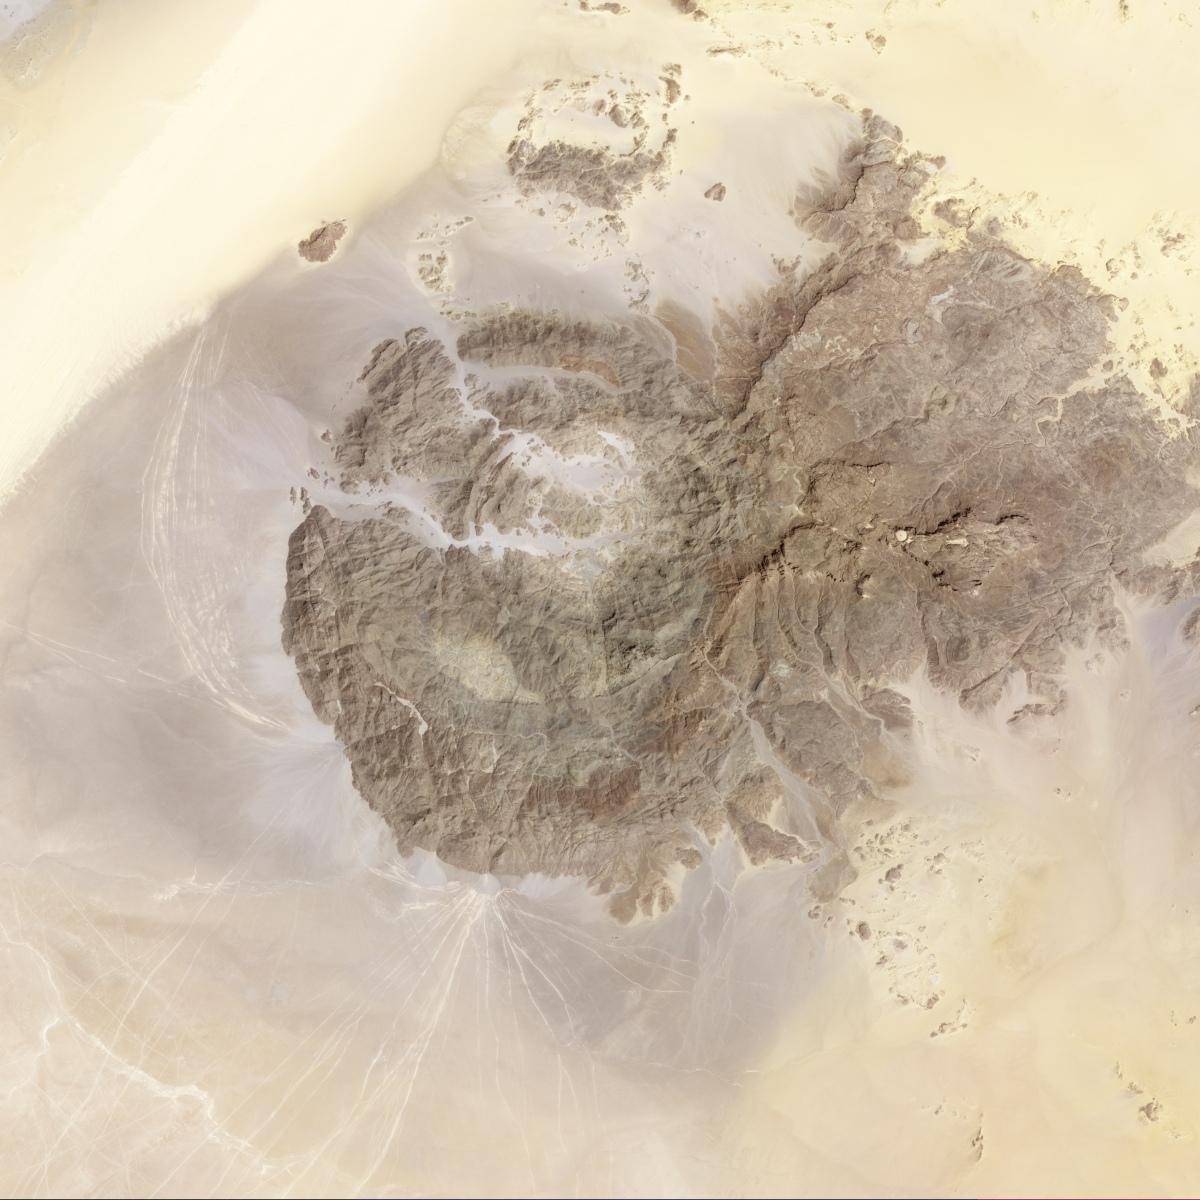 NASA Jebel Uweinat